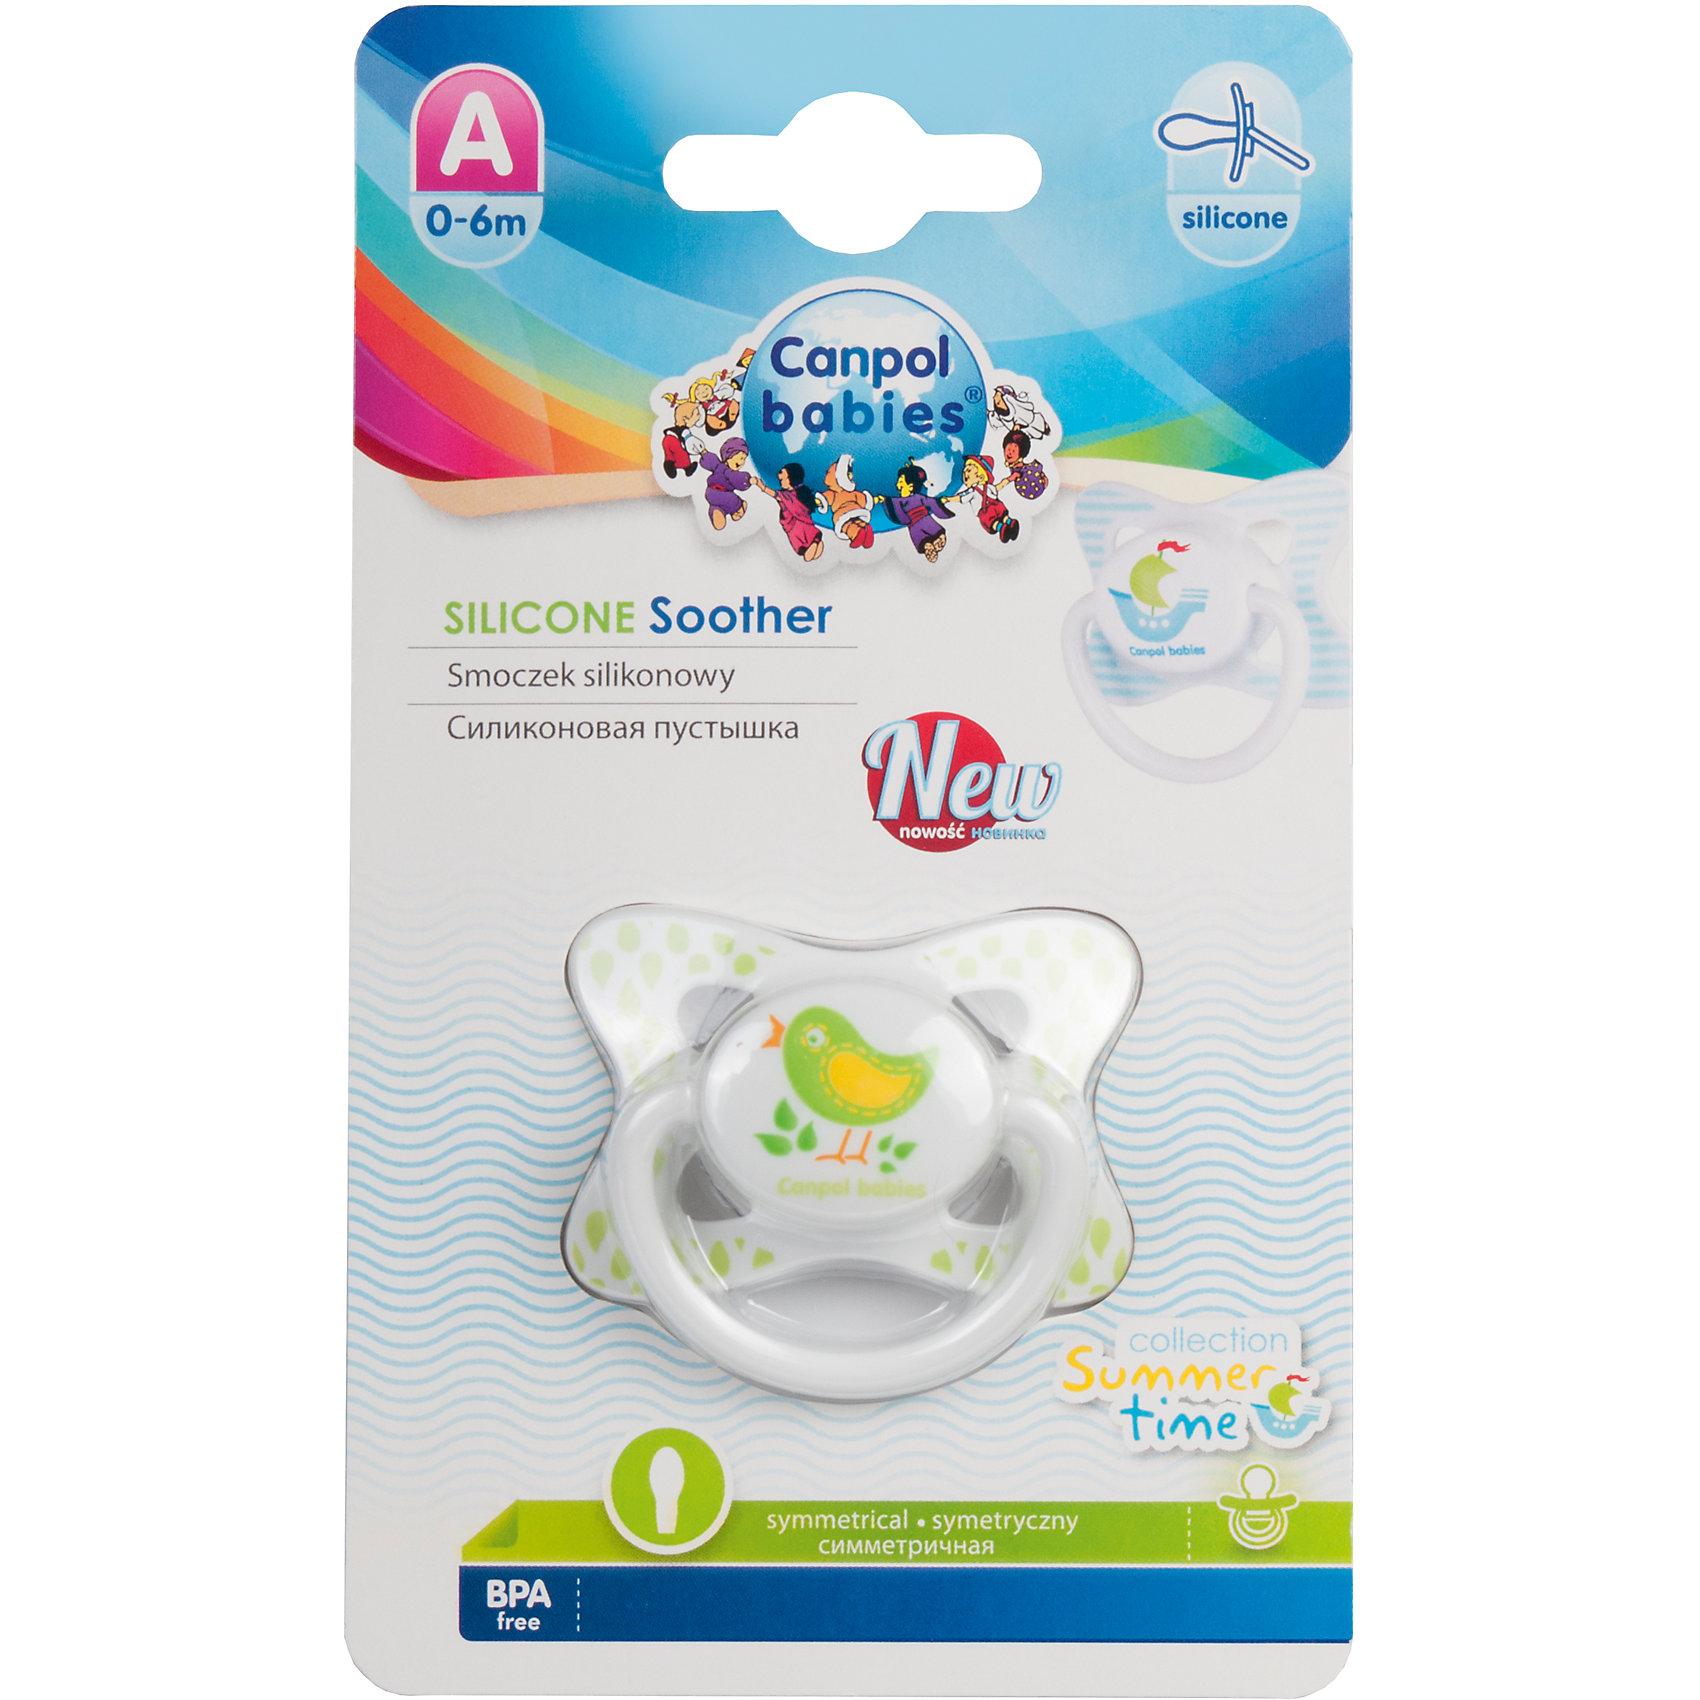 Canpol Babies Пустышка симметричная силиконовая, 0-6 Summertime, Canpol Babies, птичка goot desoldering wick remover 2 5mm x 1 5m